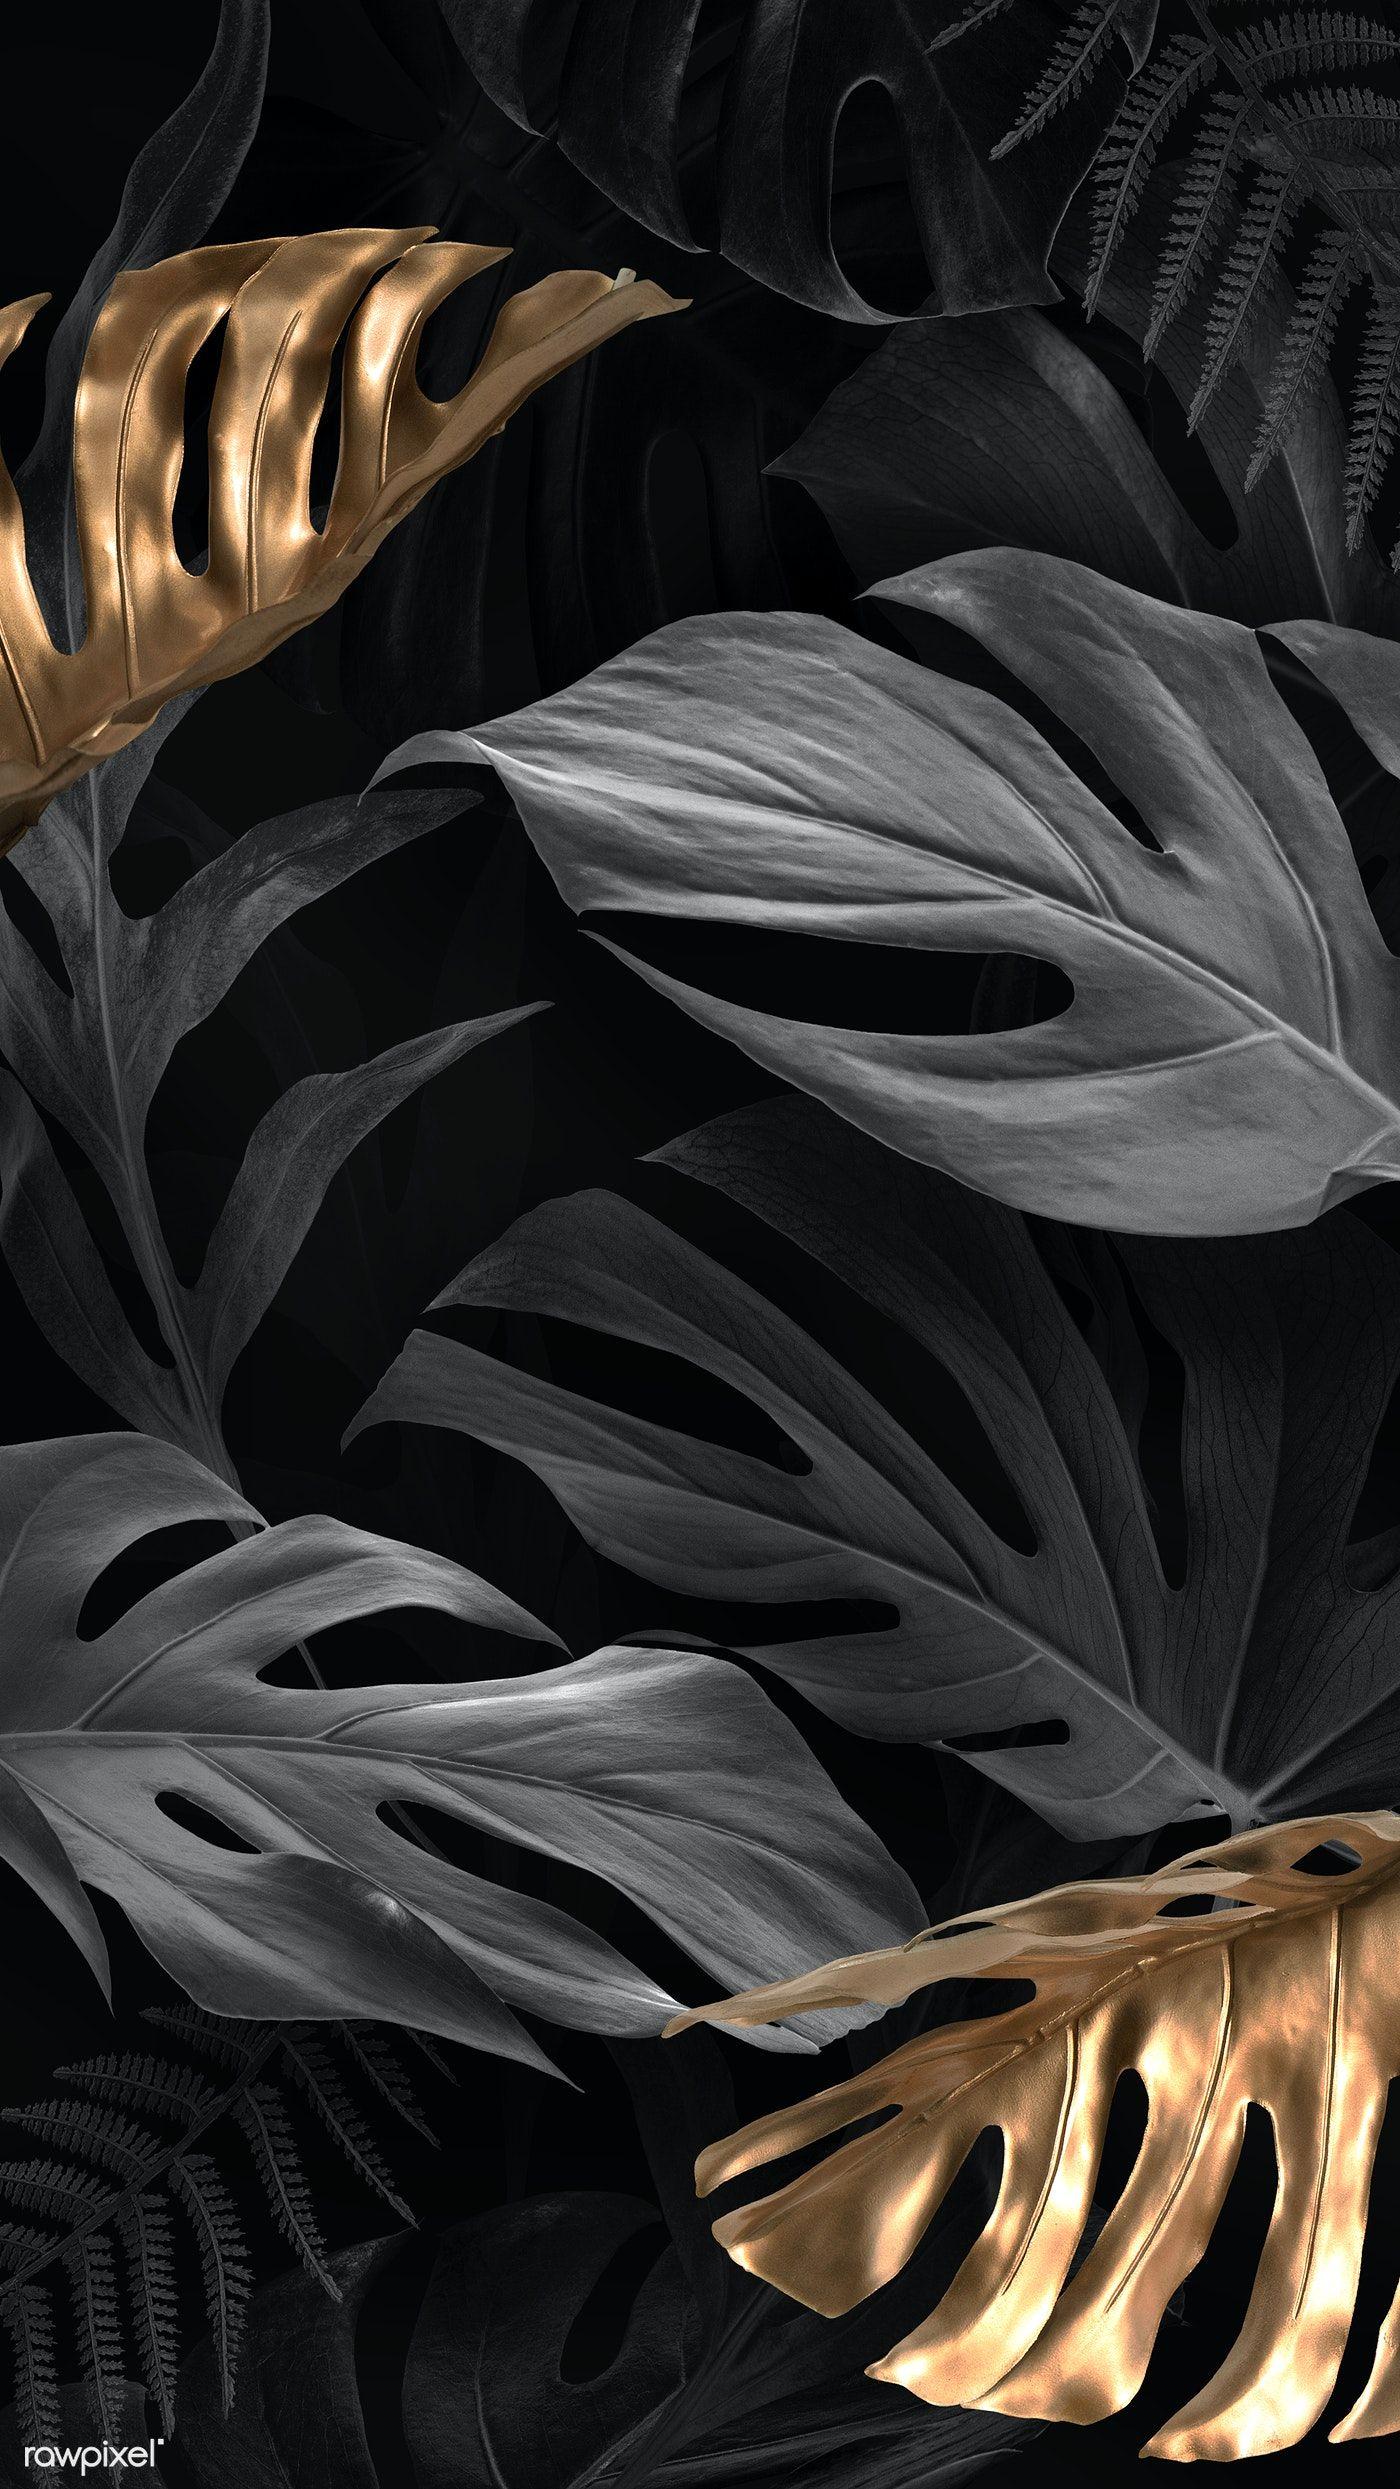 Download premium illustration of Gold and black Monstera Deliciosa leaves